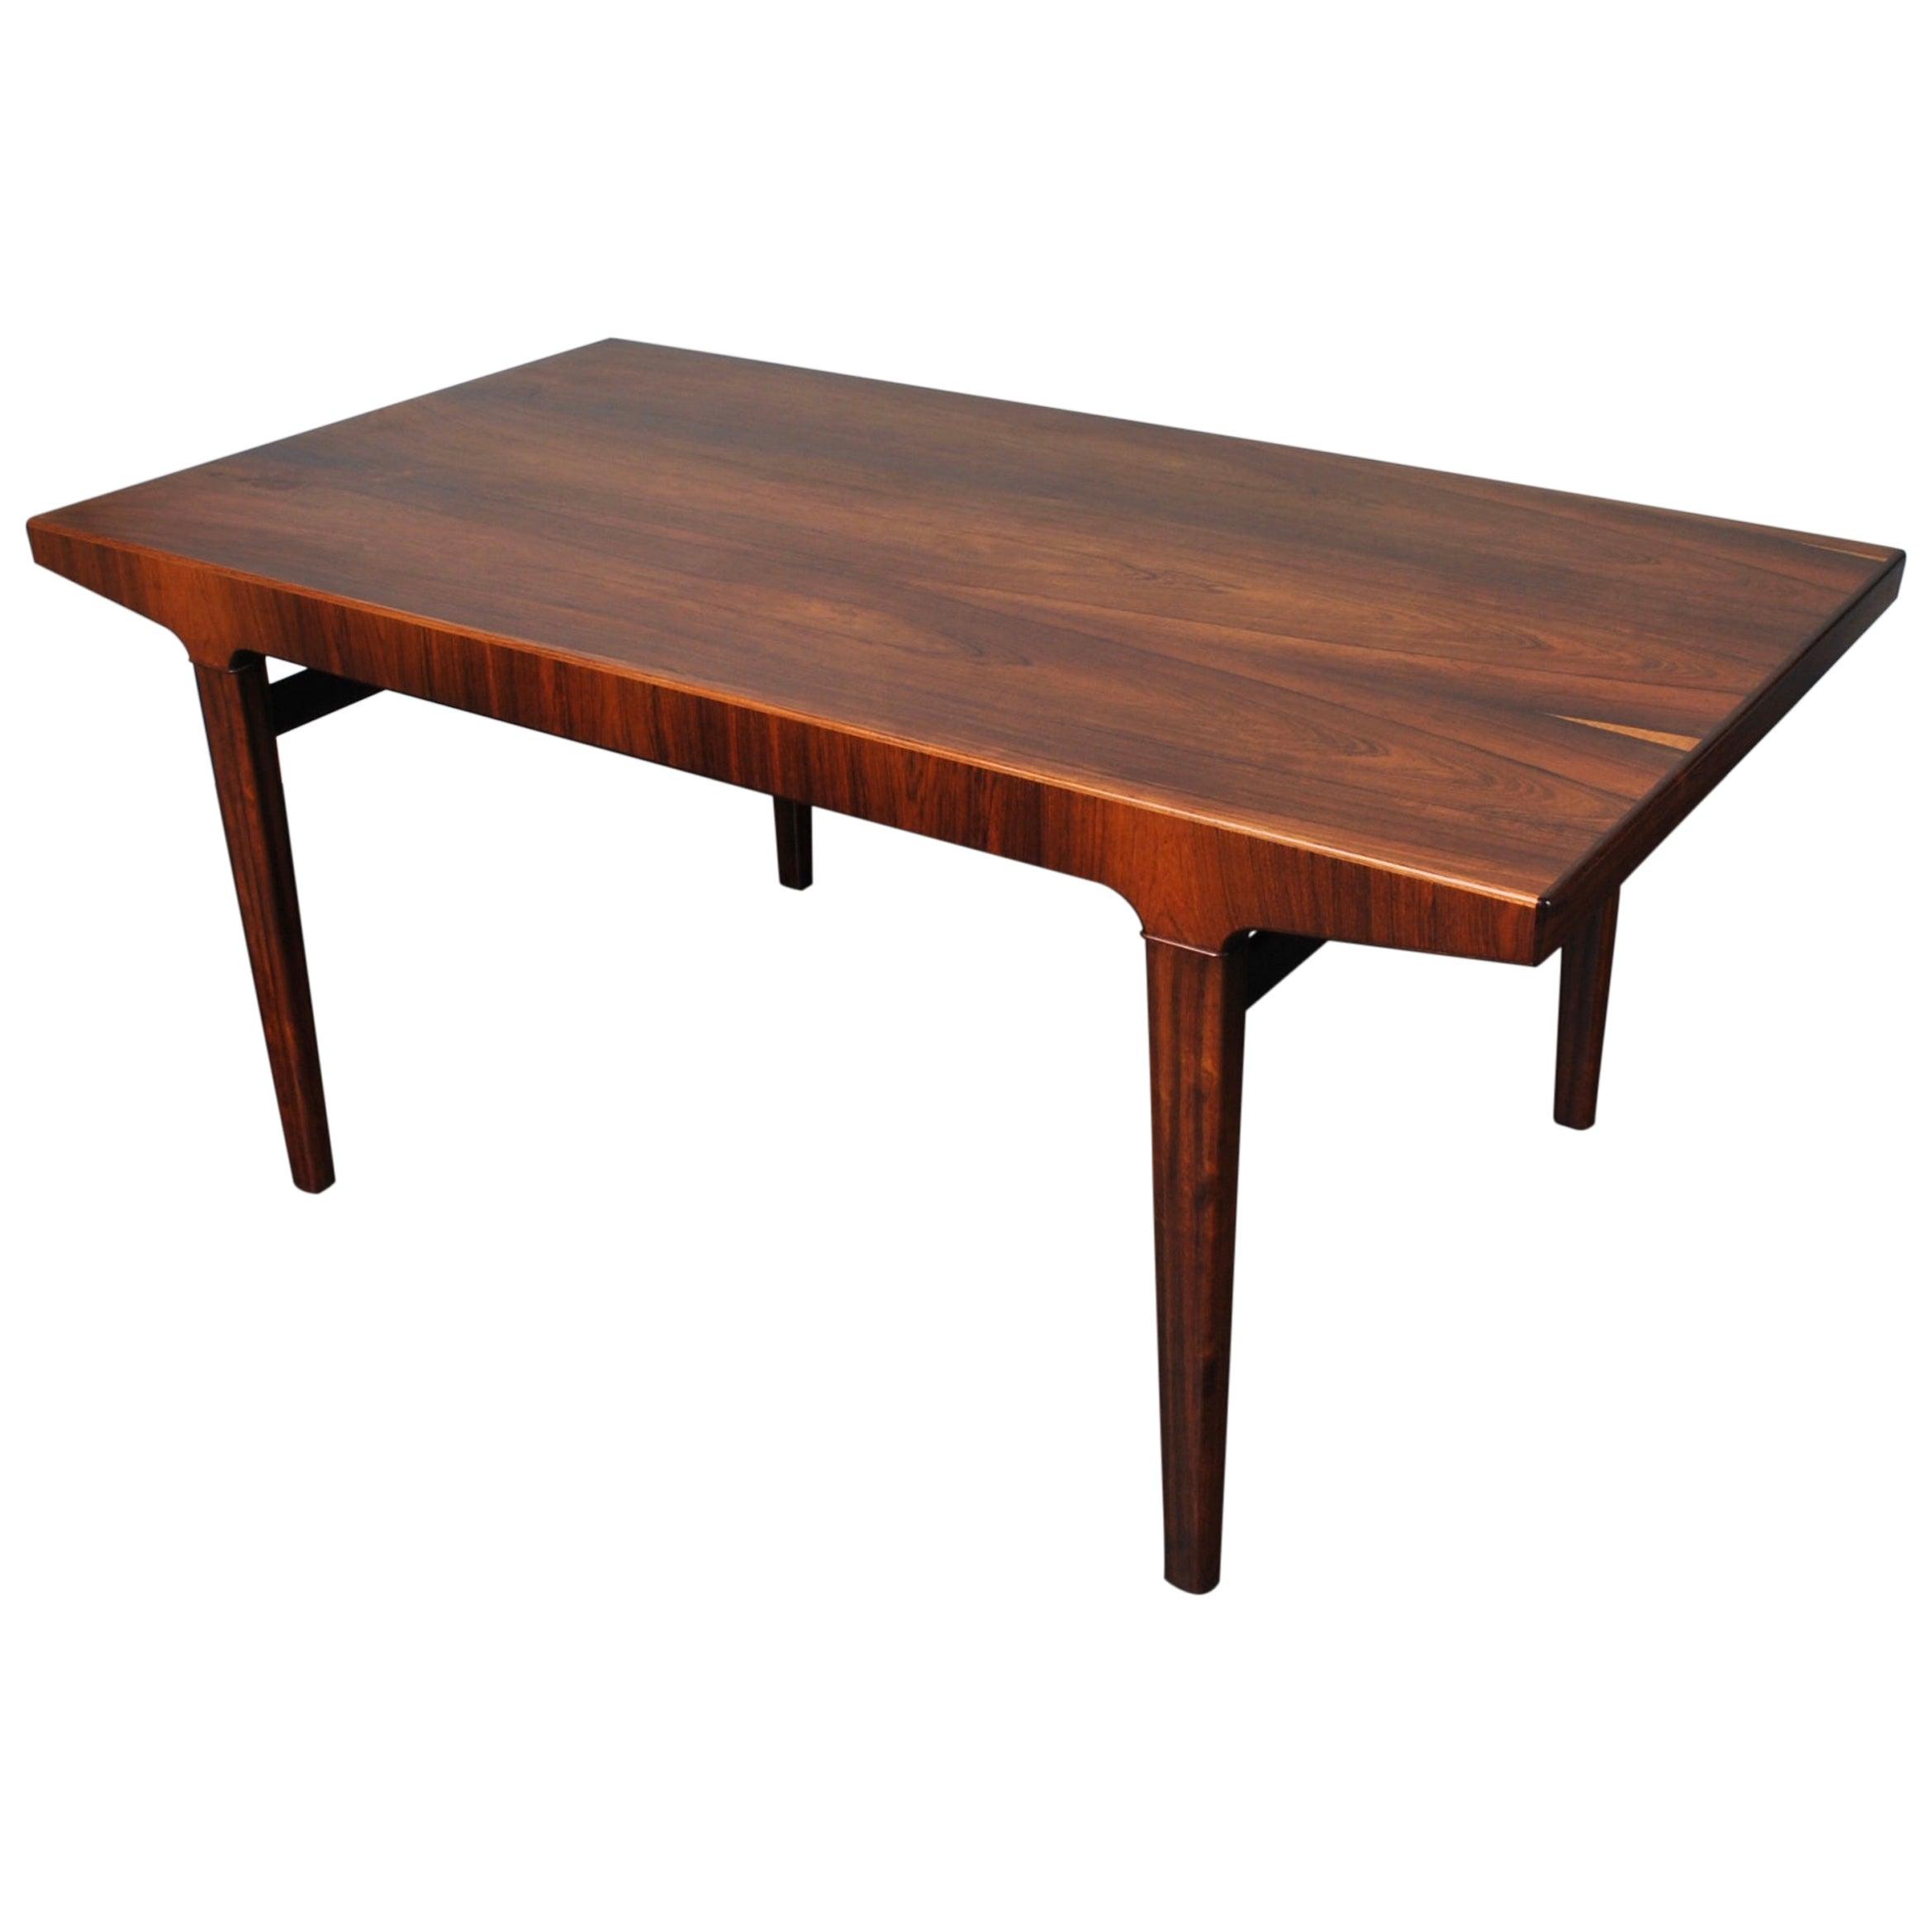 Large Rosewood Dining Table, L. Chr. Larsen & Son, Denmark.